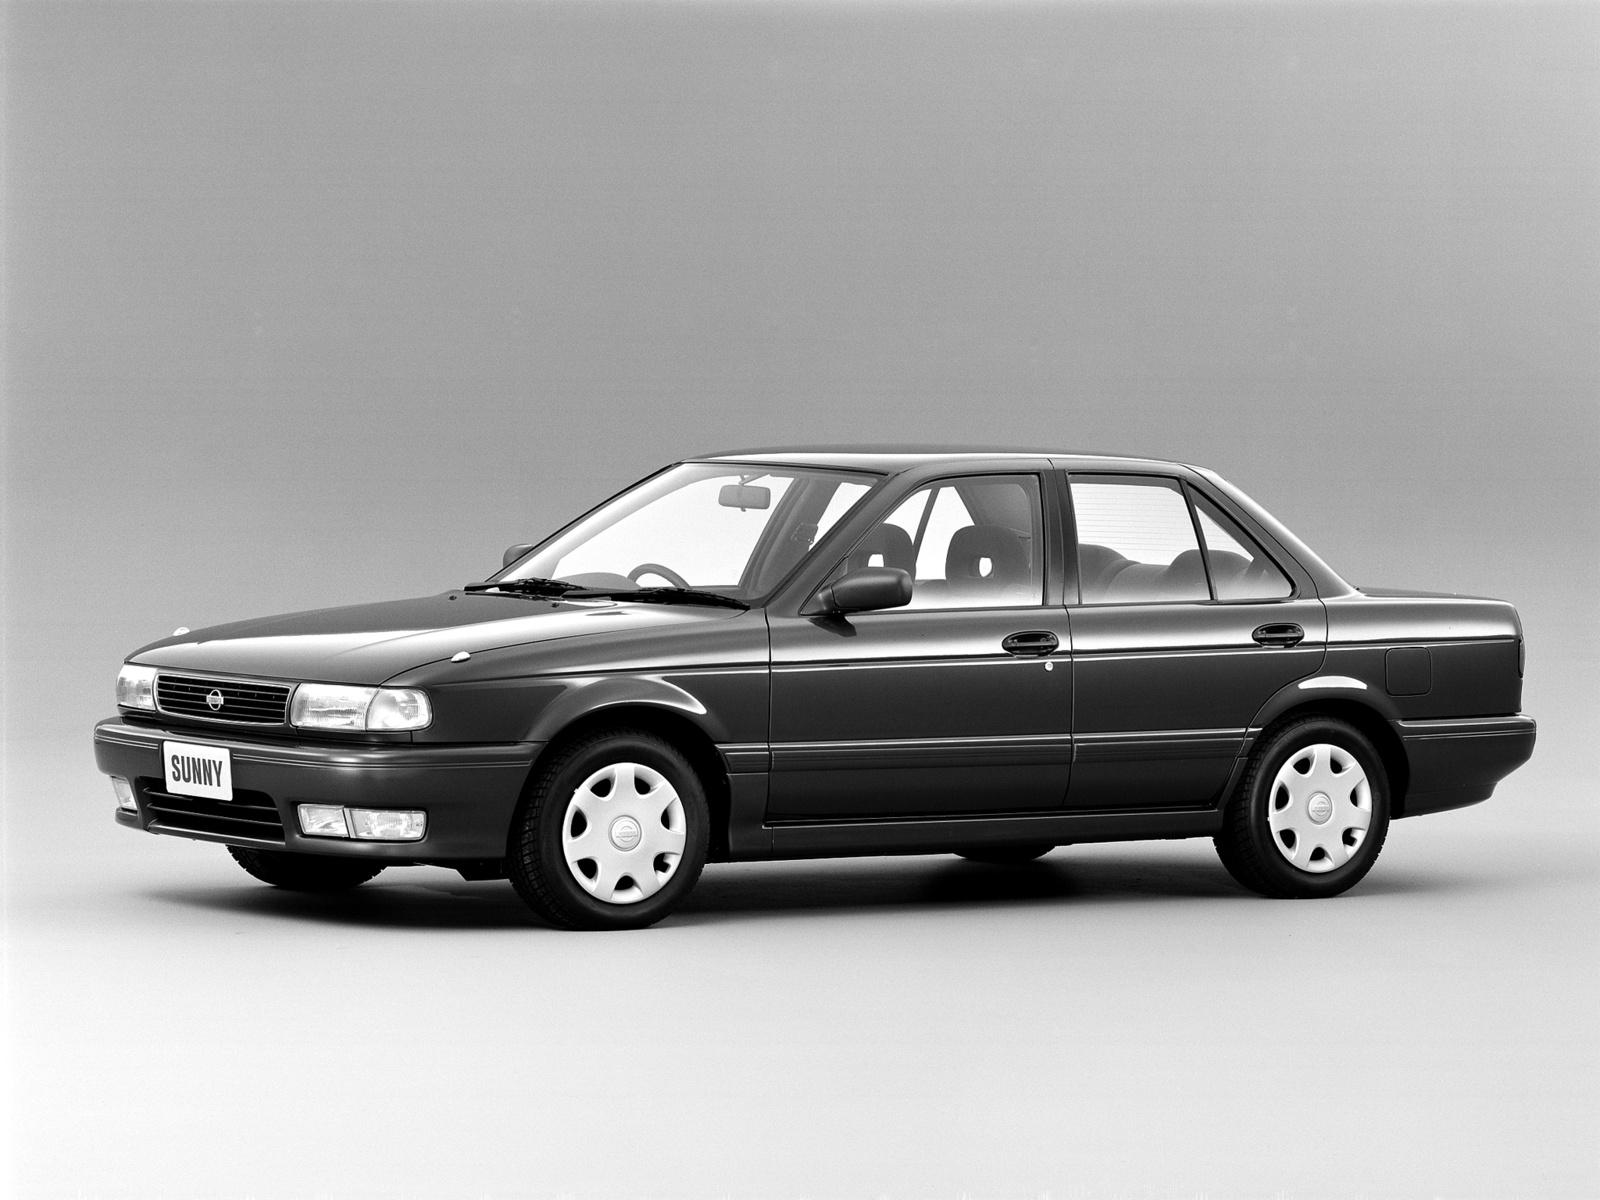 Renault 19 — описание модели